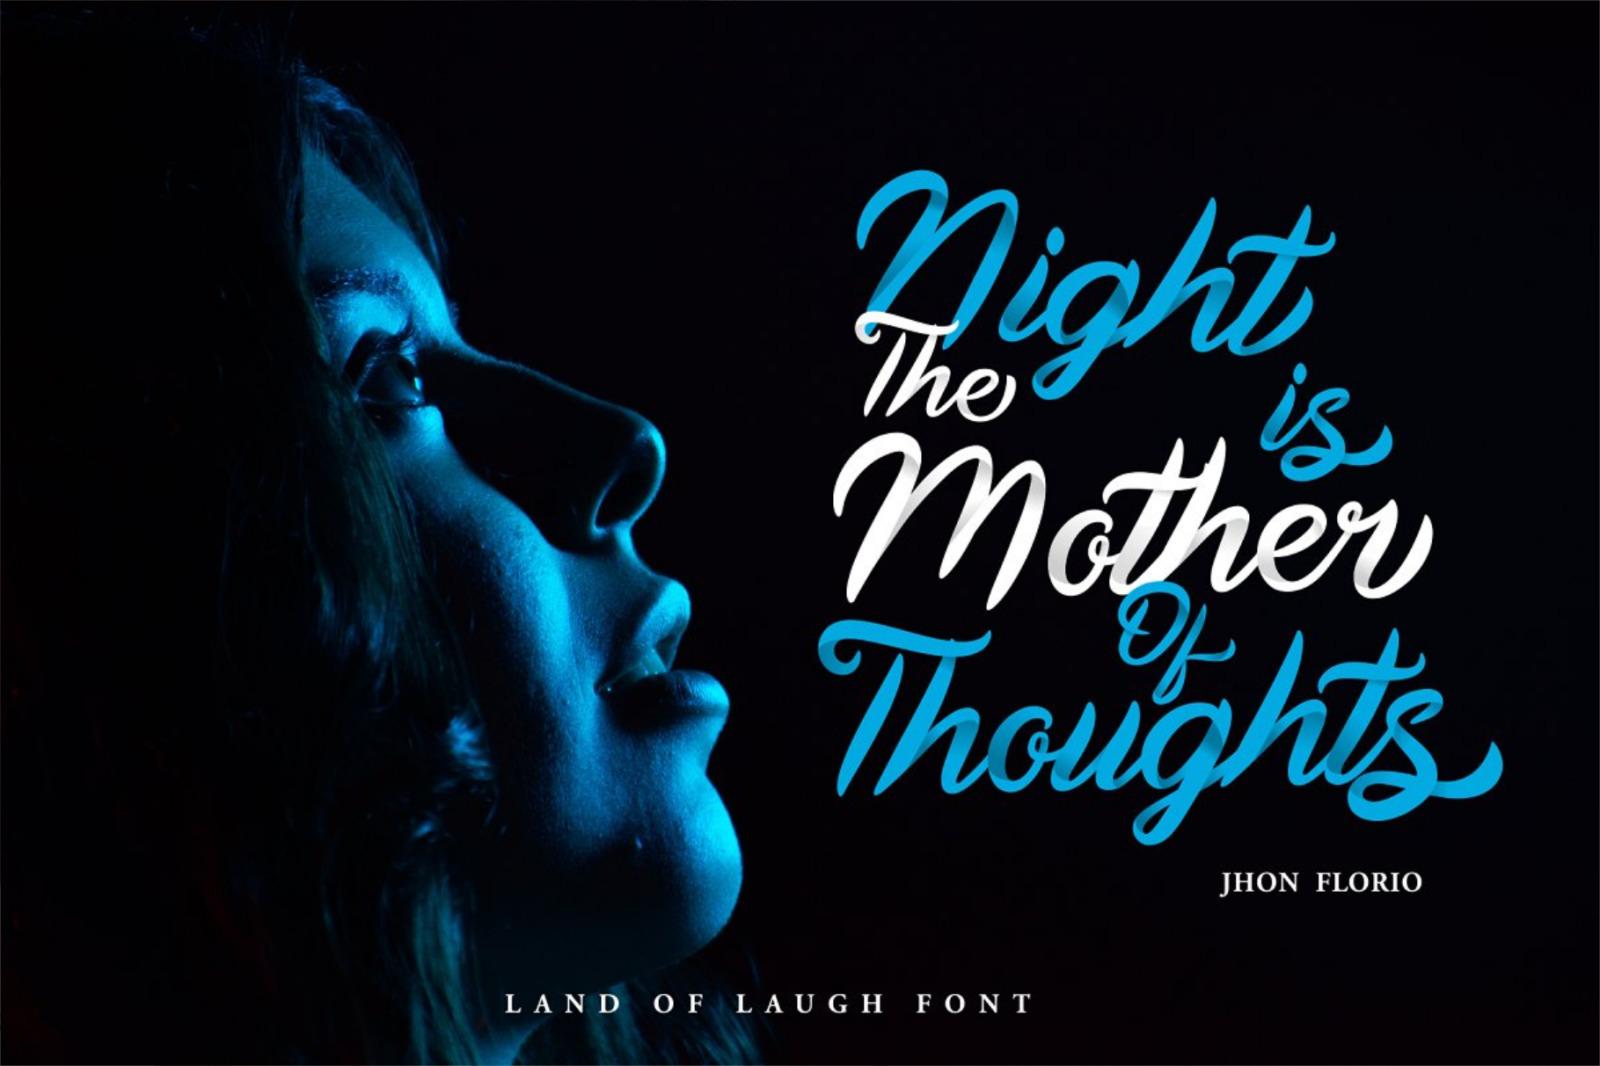 Land Of Laugh - Clean & Rough Font - 1542742 full